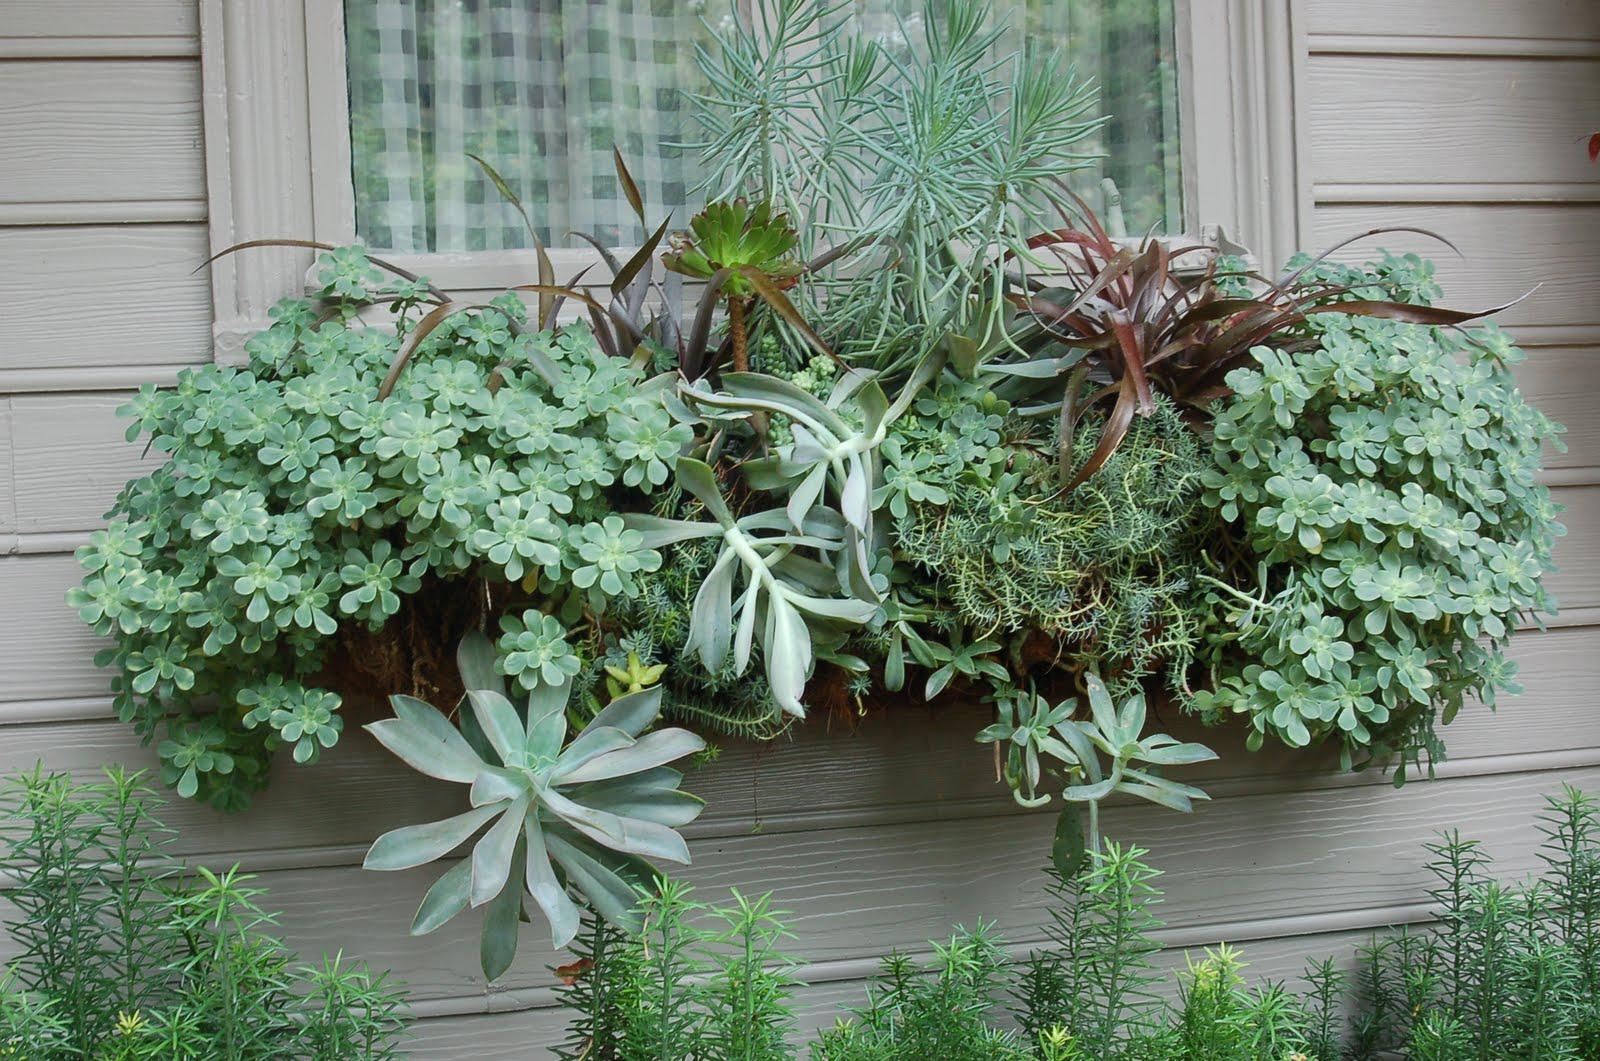 Bwisegardening day 91 a succulent sensation - Succulent container gardens debra lee baldwin ...